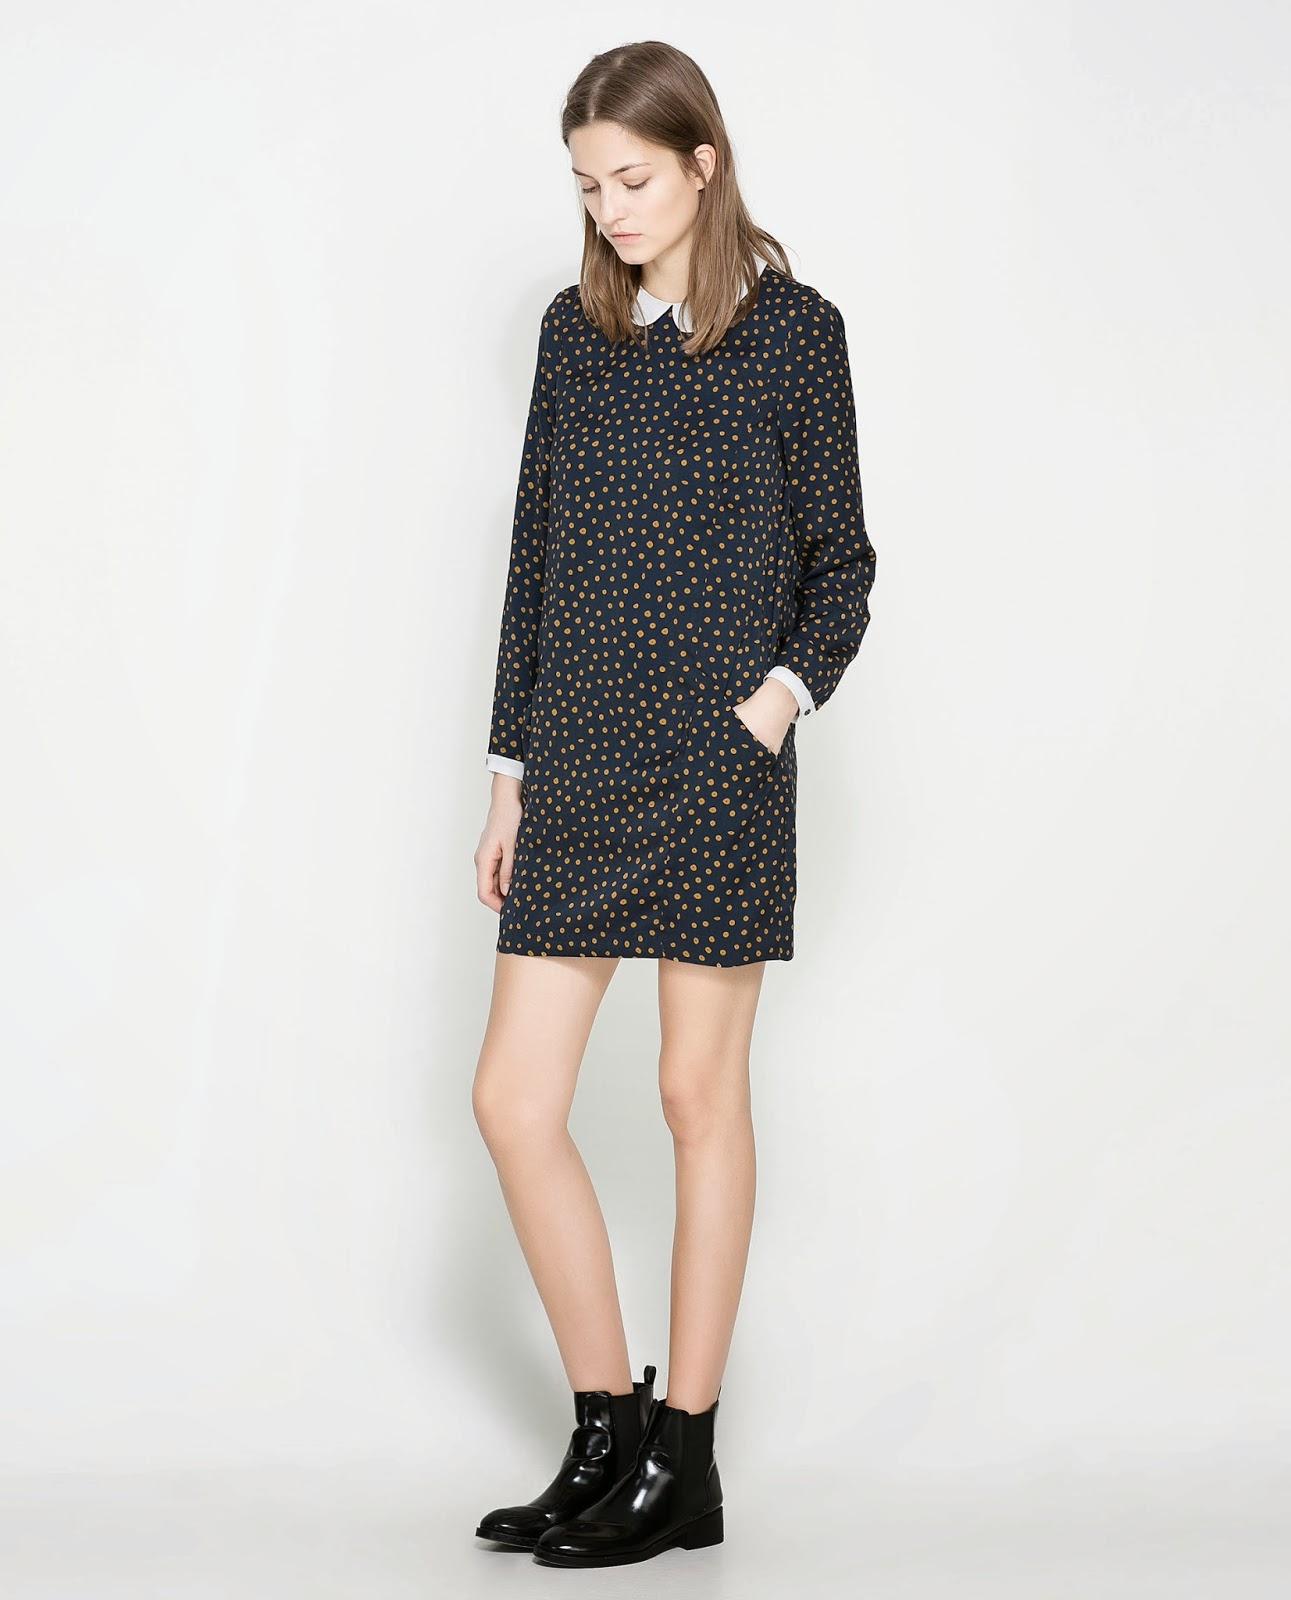 Zara spot dress